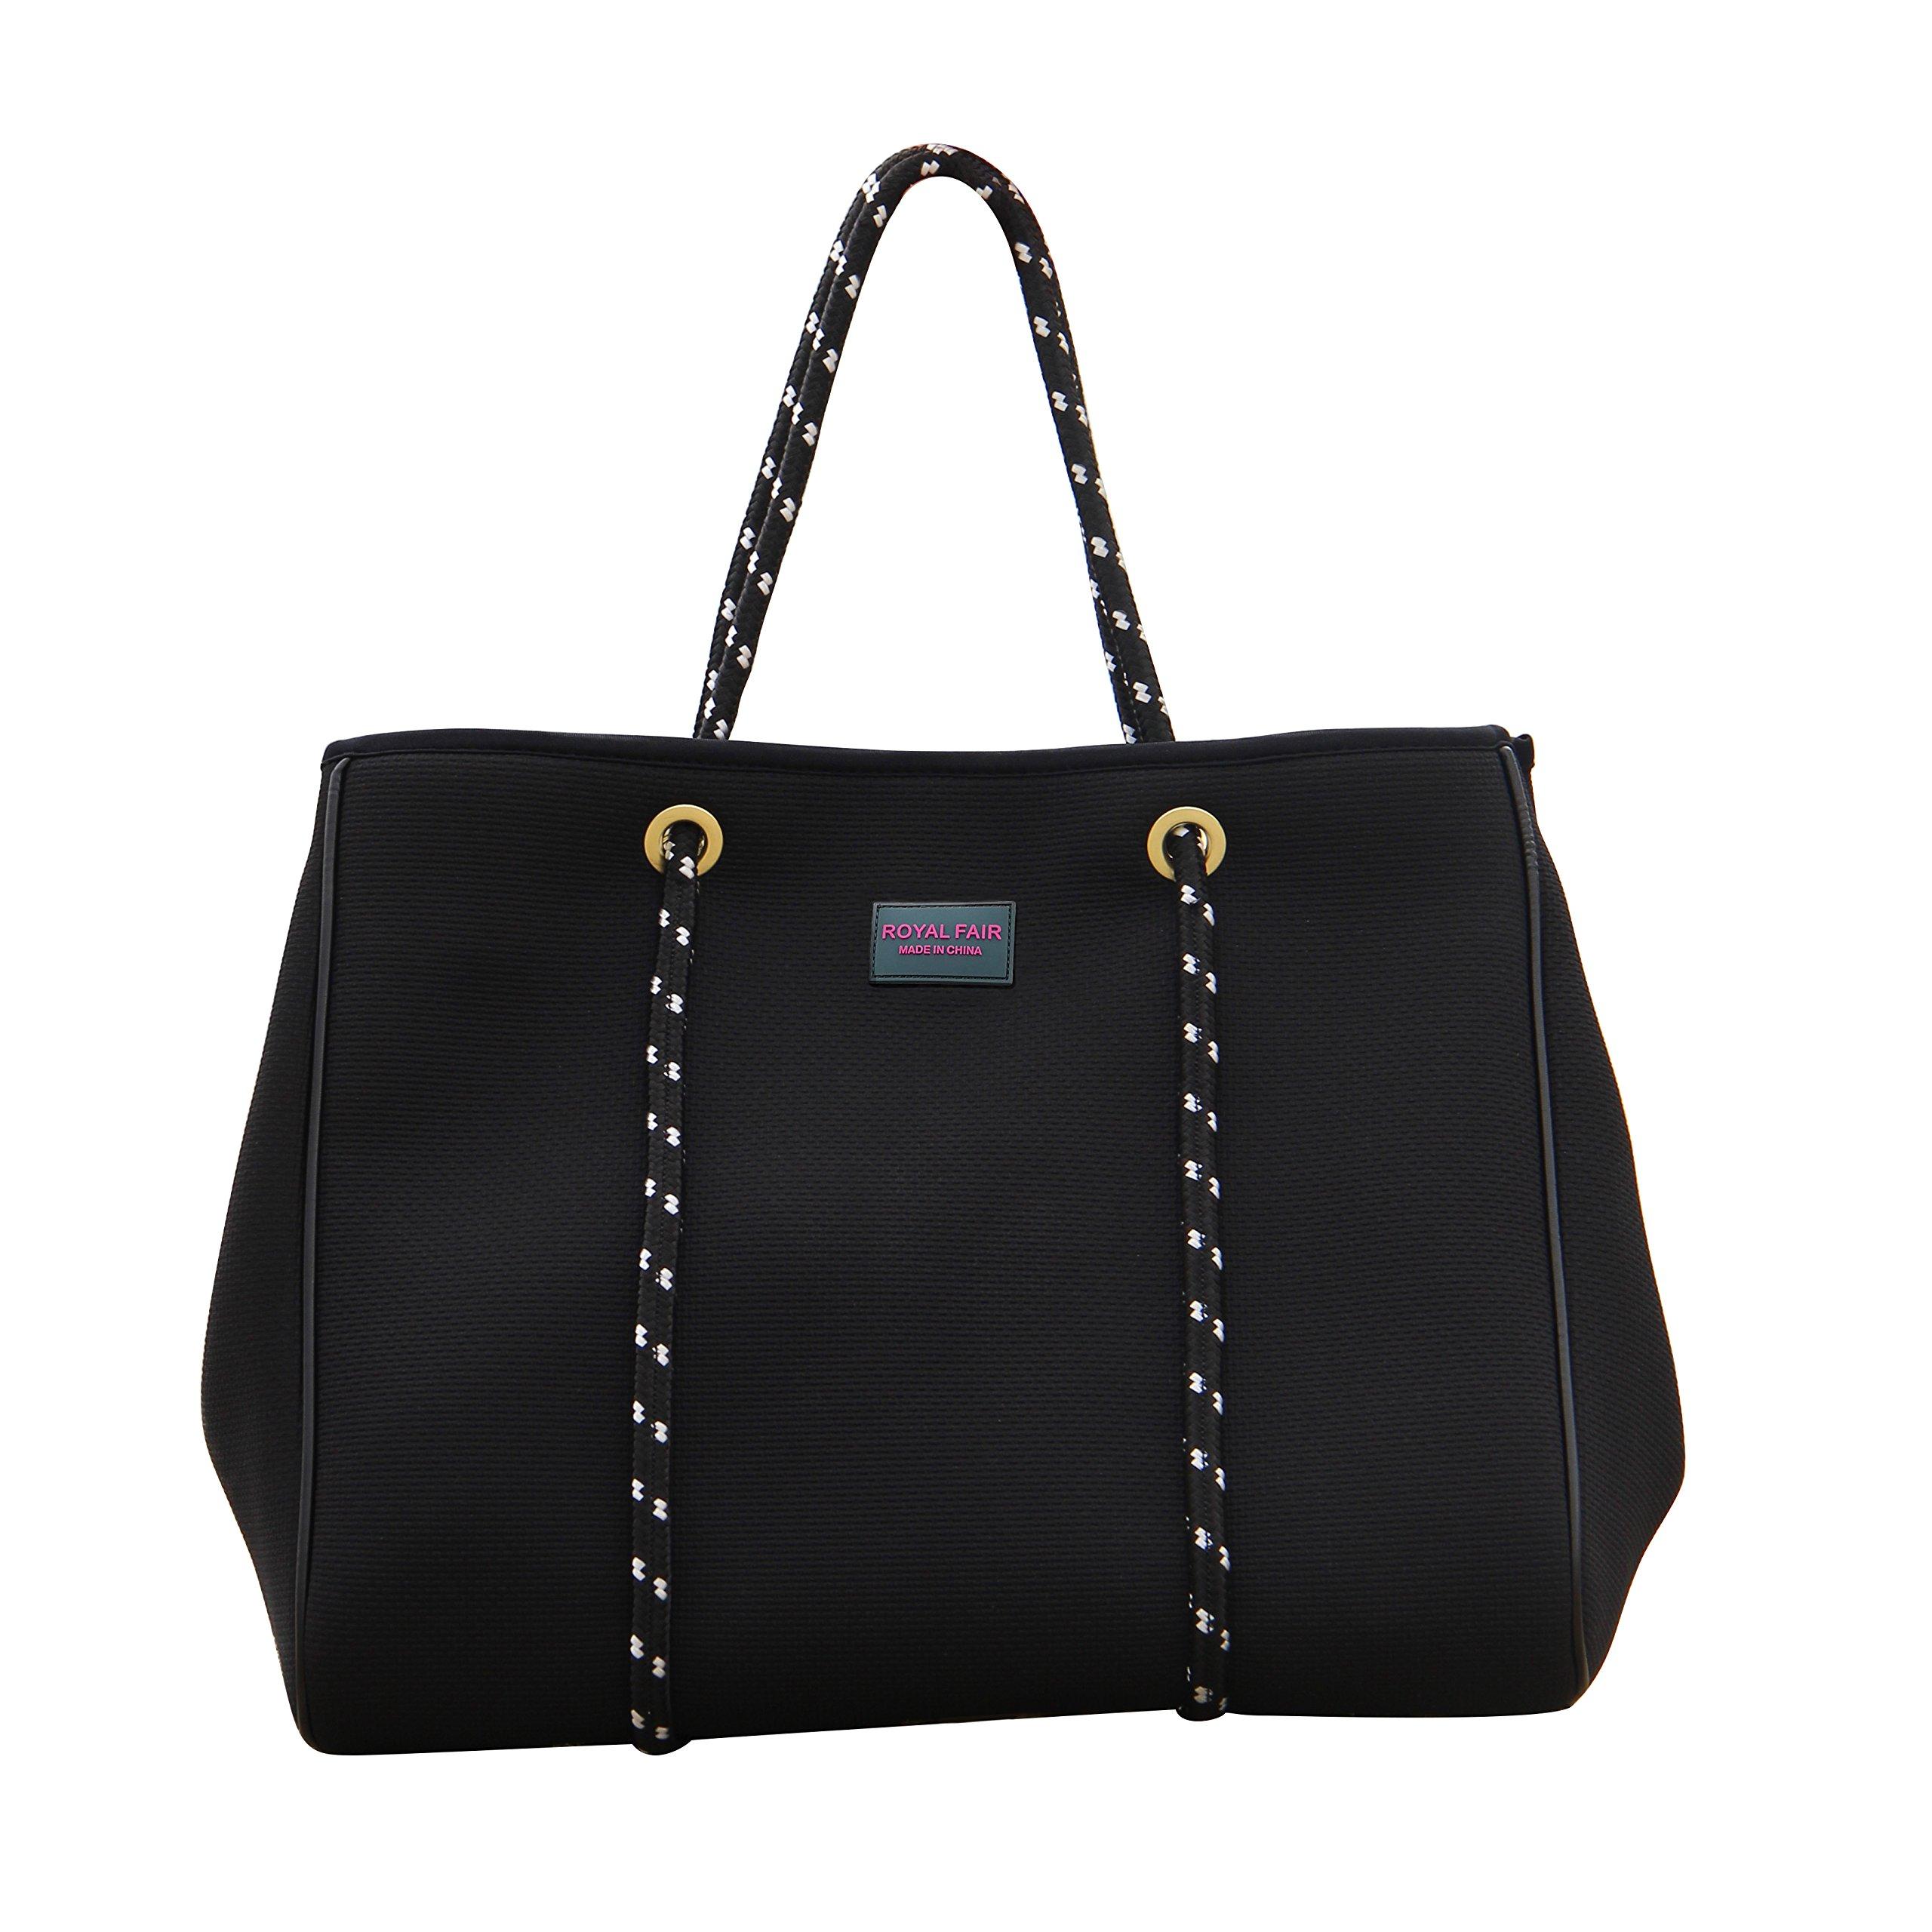 Beach Bags for Women Multifunctional Waterproof Travel Totes with Inner Zipper Pocket Royal Fair (Black)